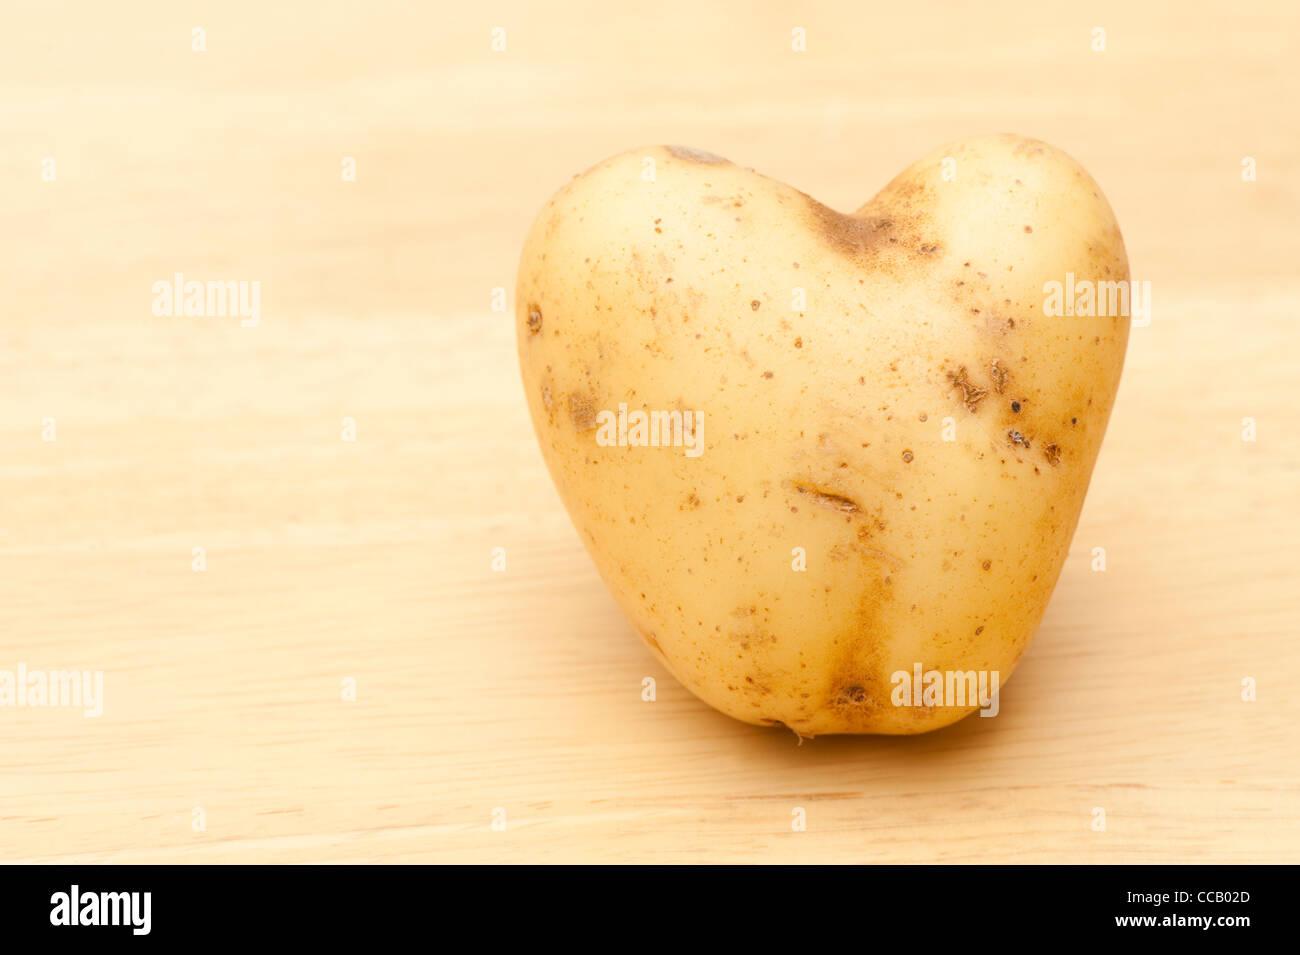 Heart-shaped 'Vivaldi' potato - Stock Image